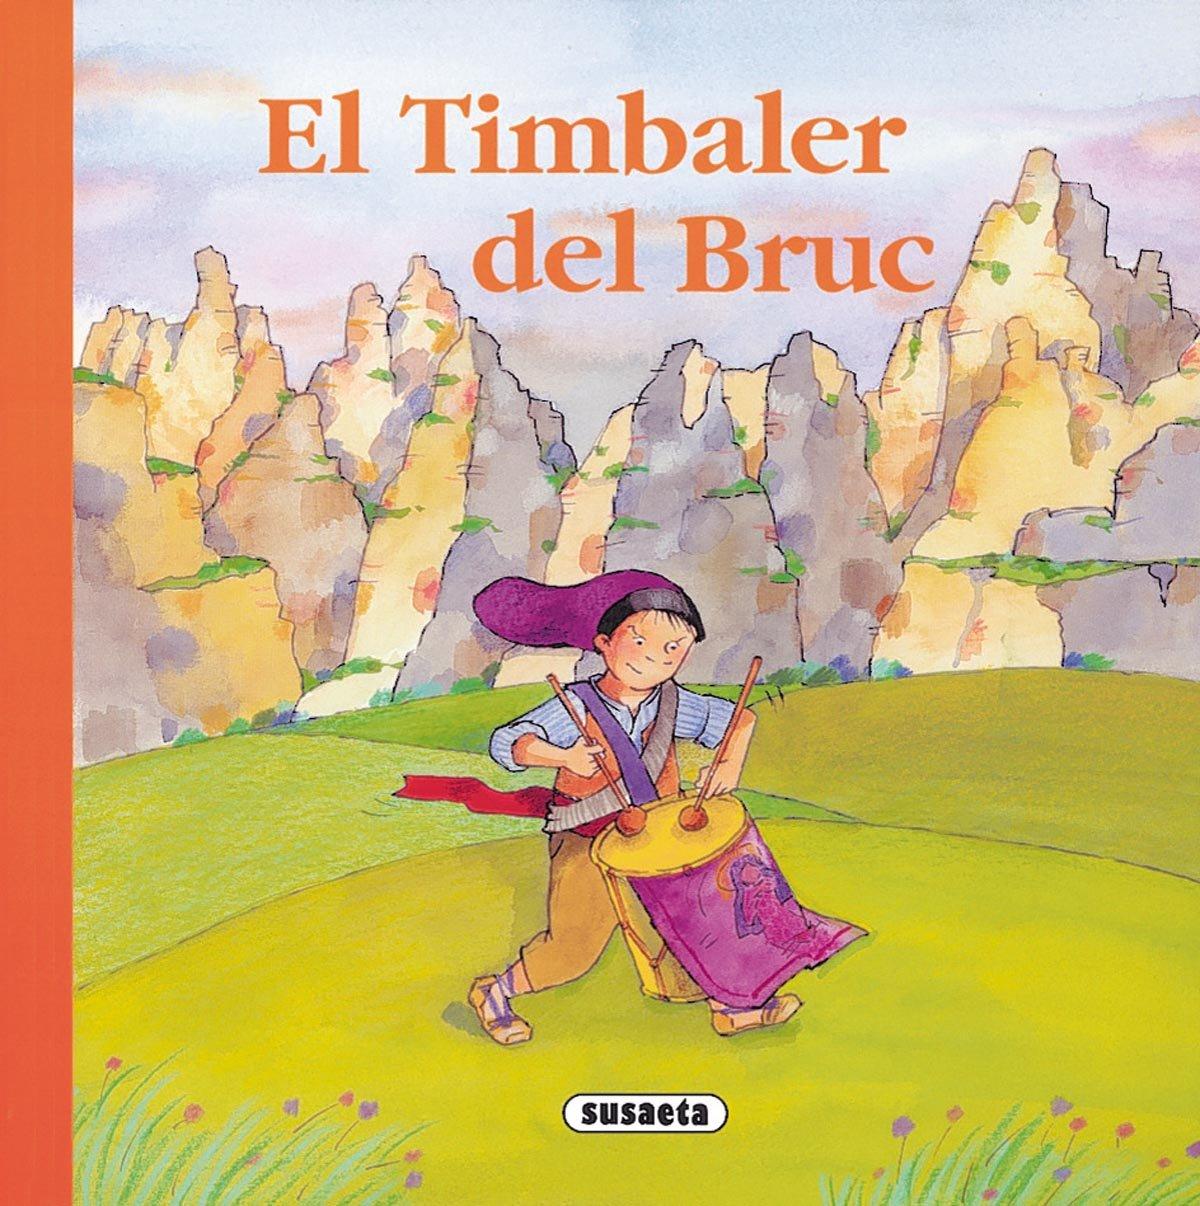 Timbaler Del Bruc, El (Rondallari): Amazon.es: Roser, Rius: Libros